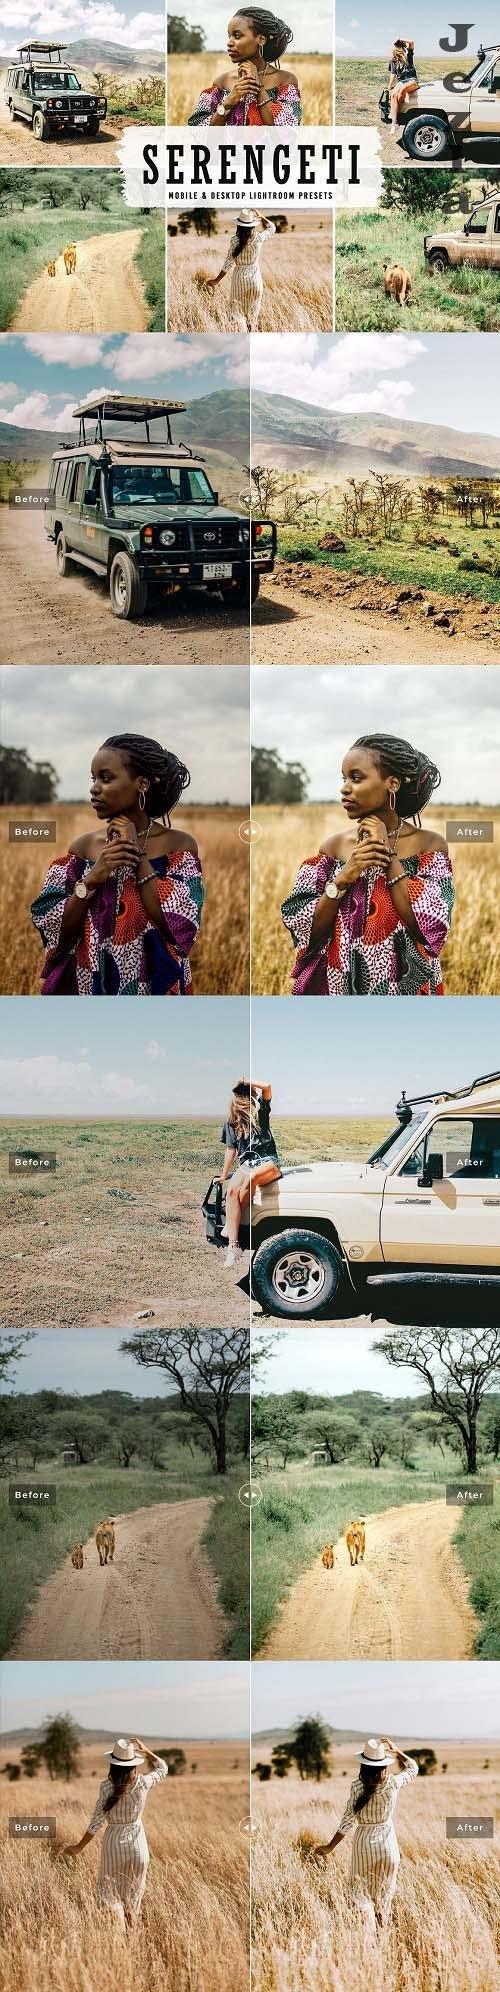 Serengeti Pro LRM Presets - 6525715